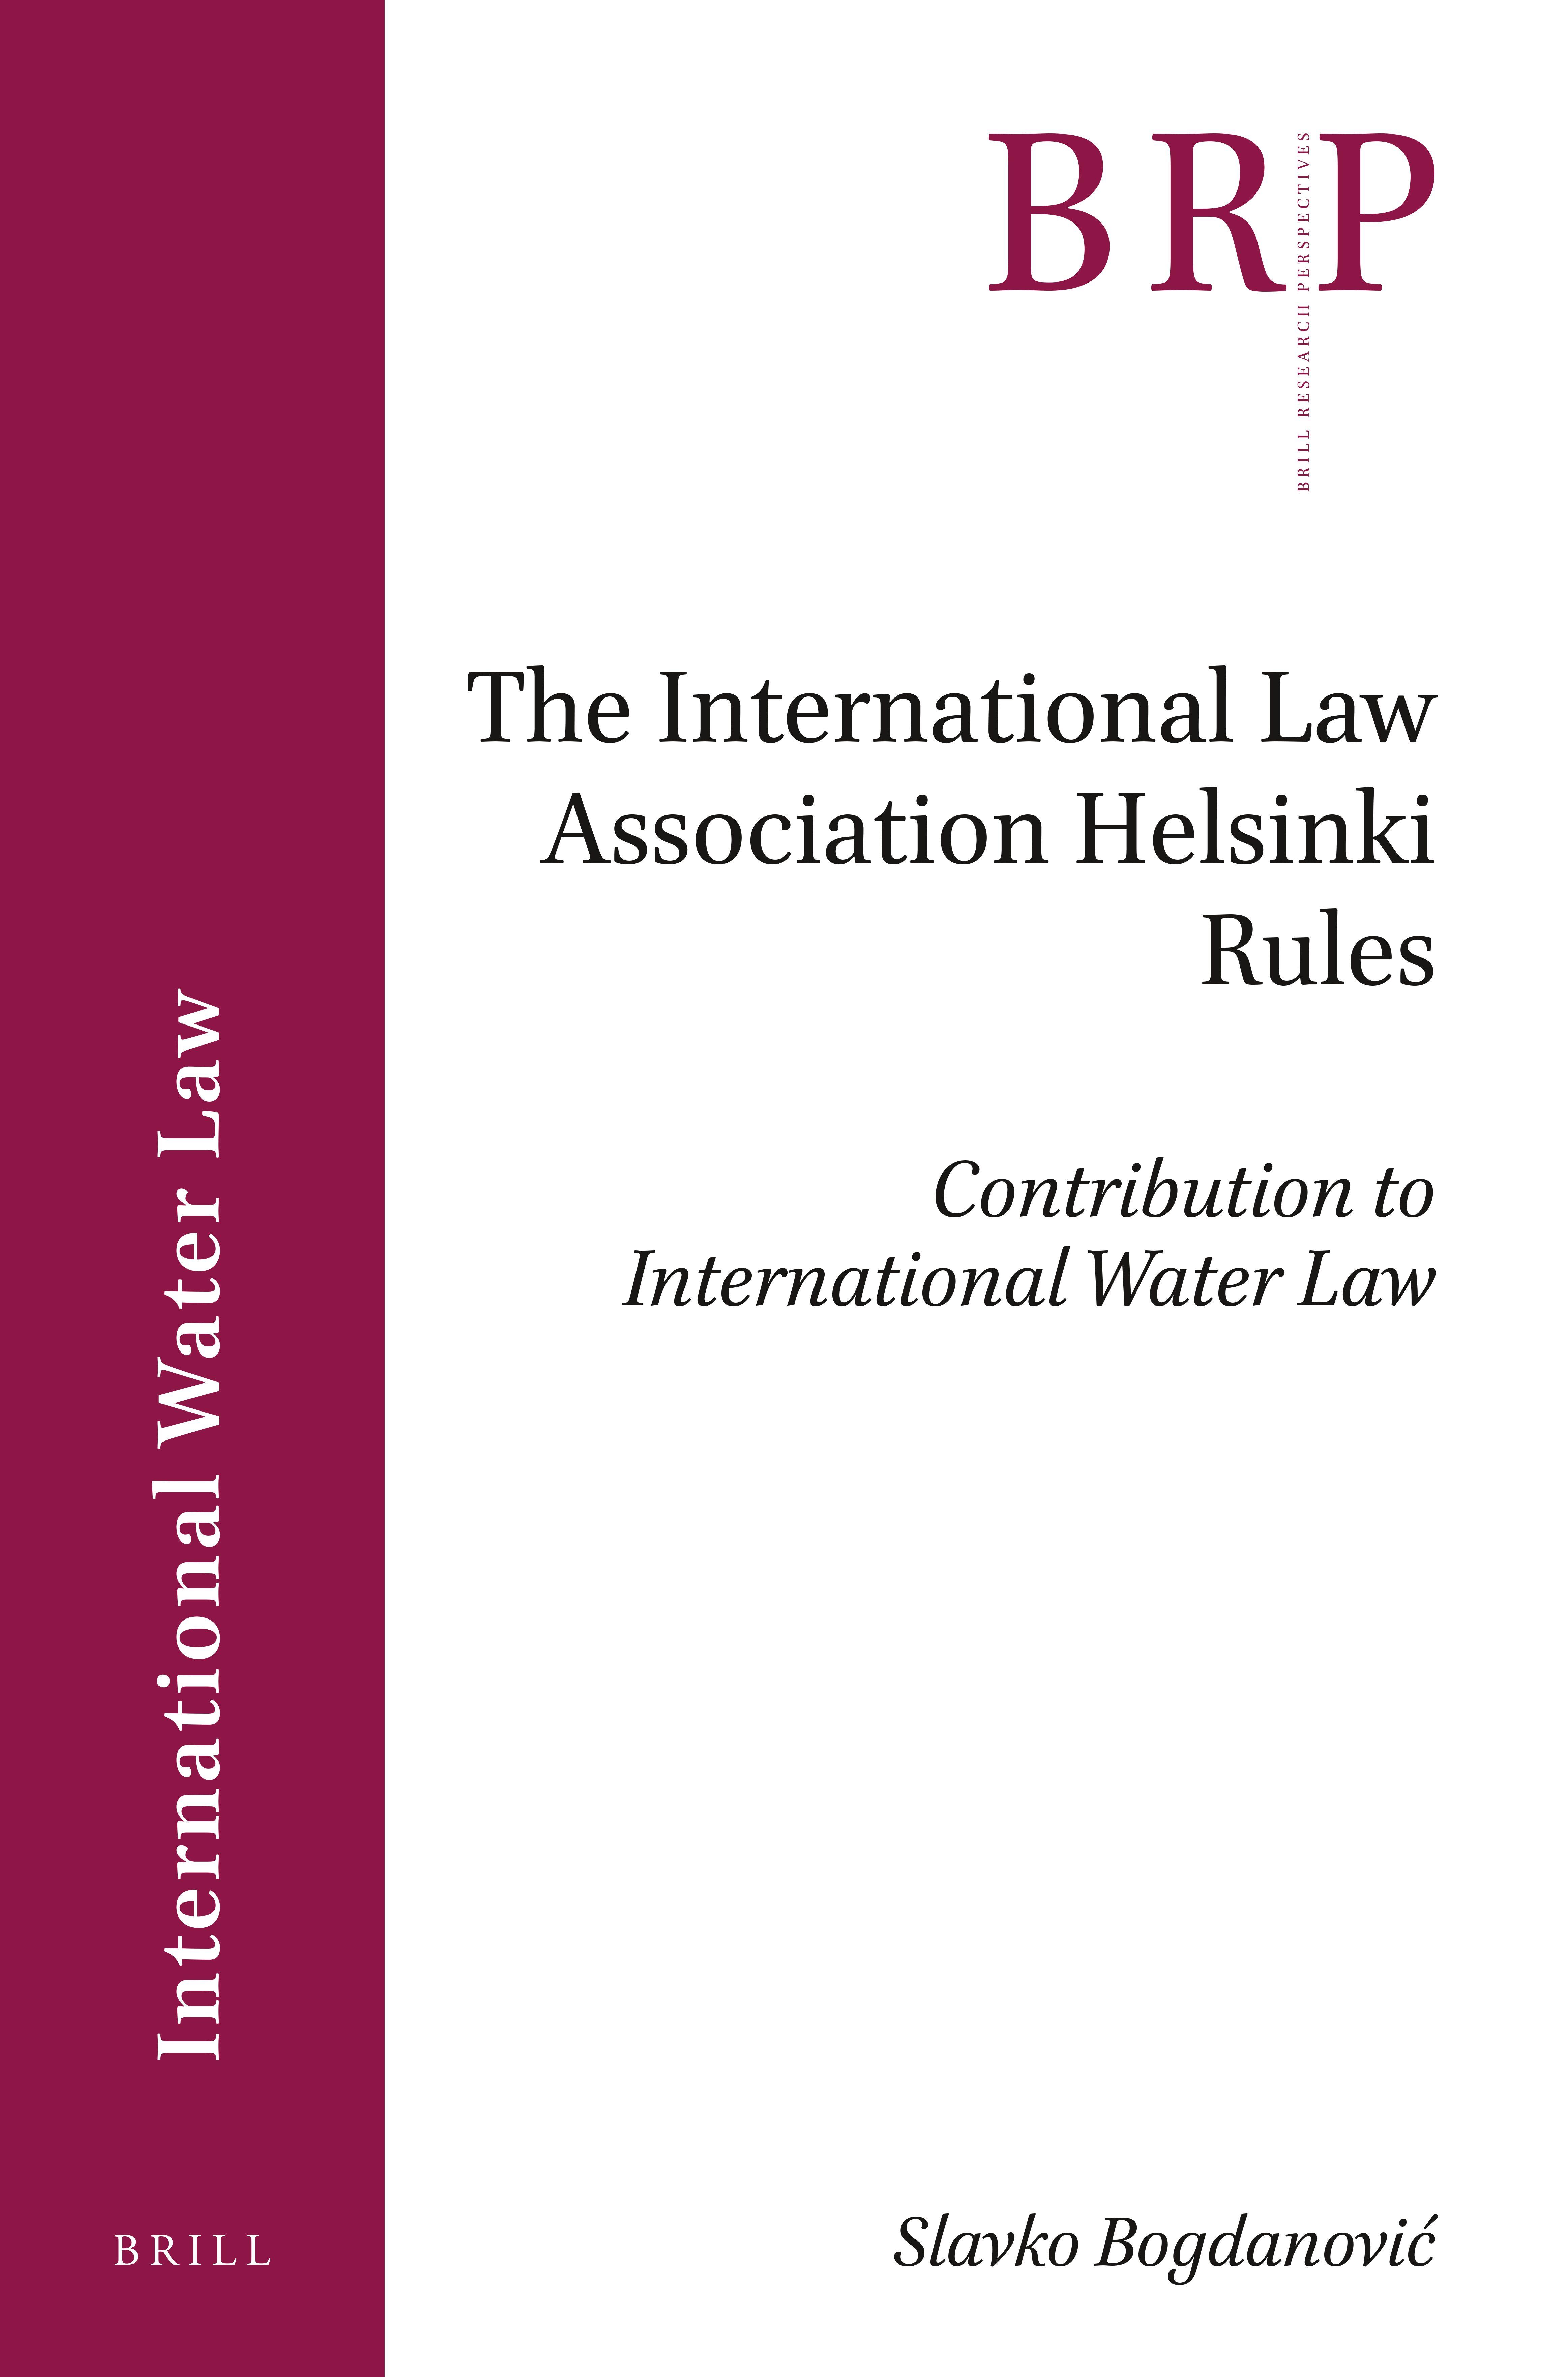 The International Law Association Helsinki Rules In The